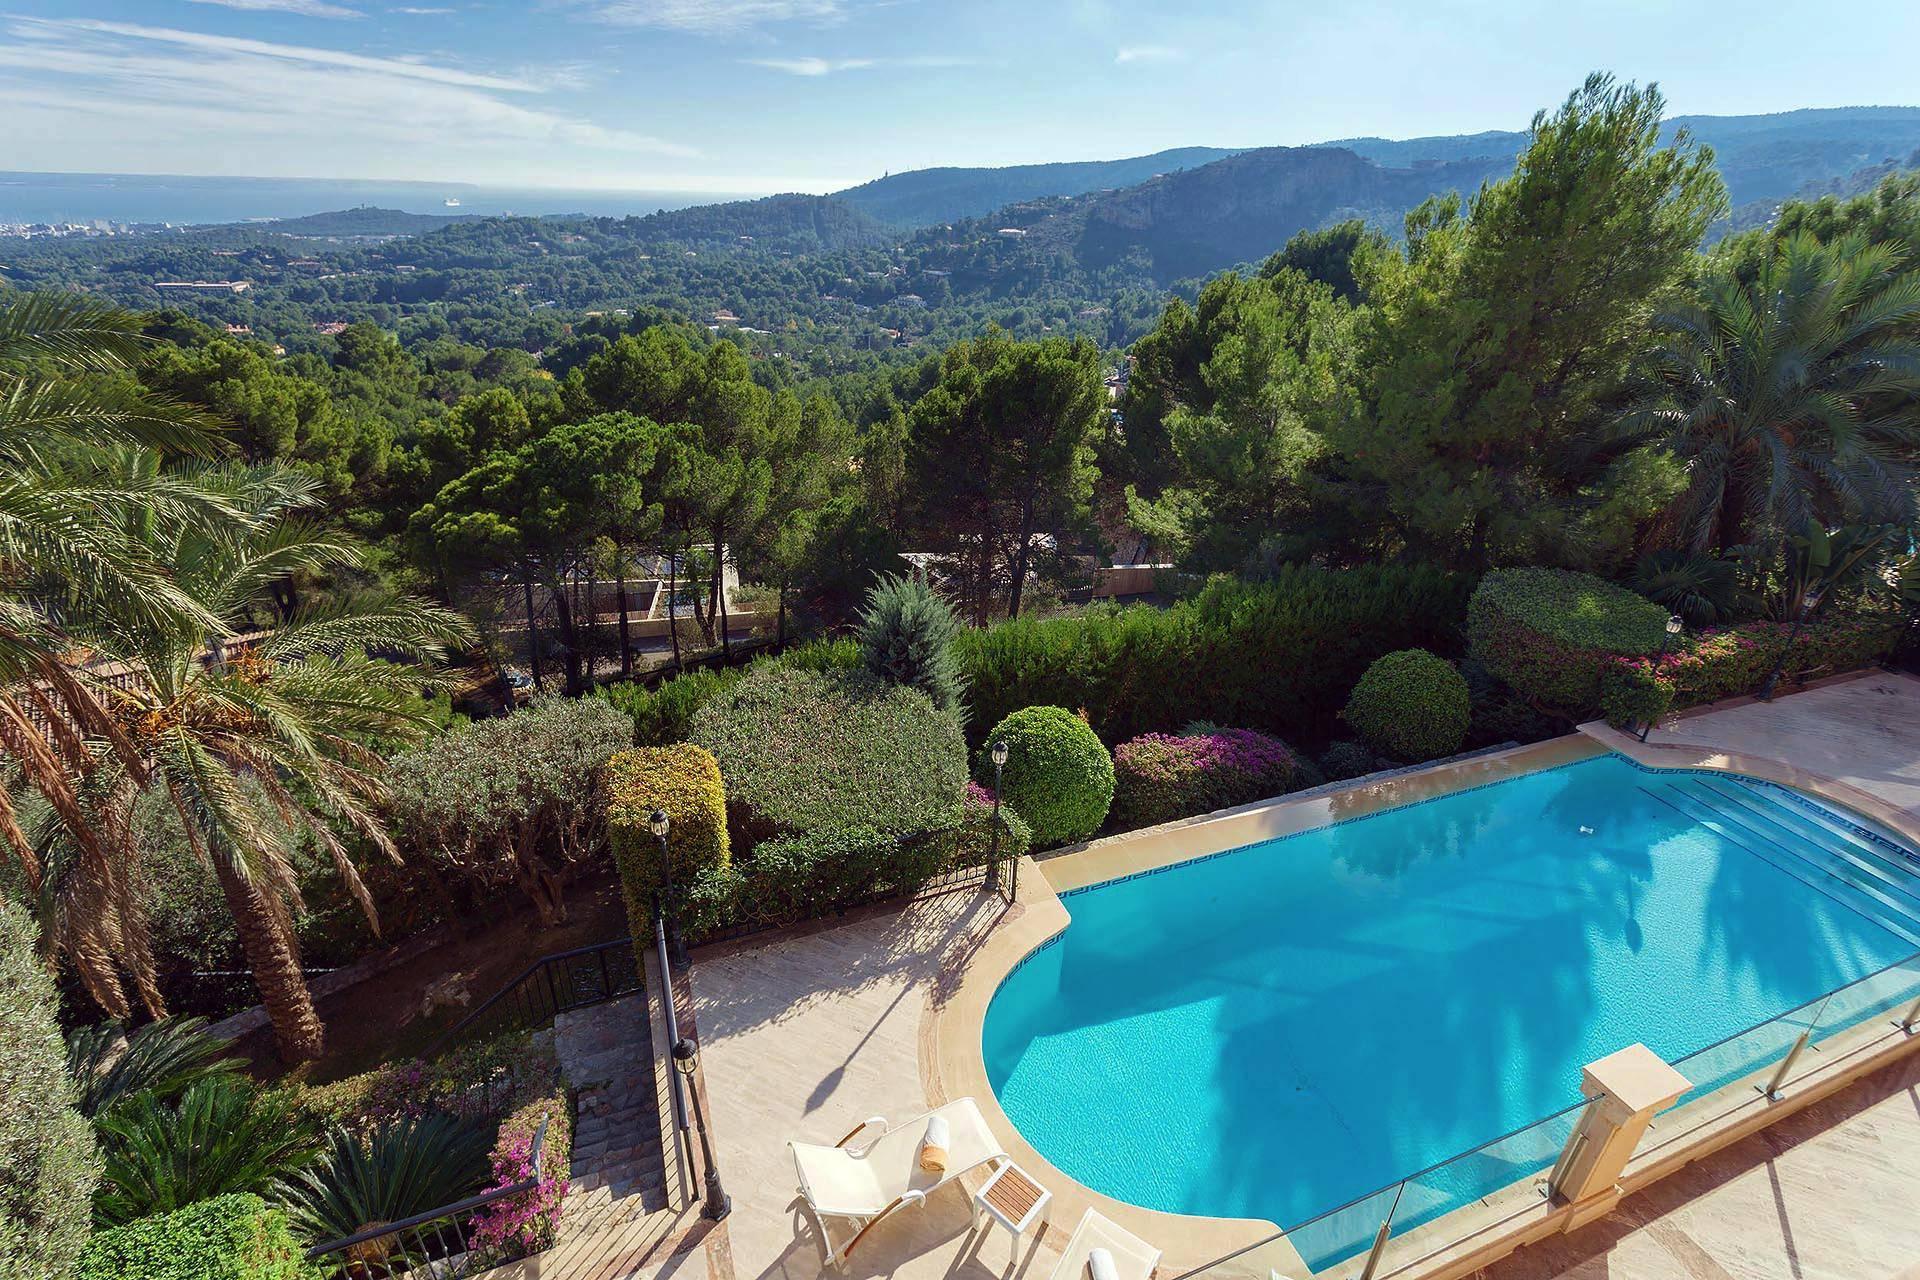 01-280 großzügige Villa nahe Palma de Mallorca Bild 4